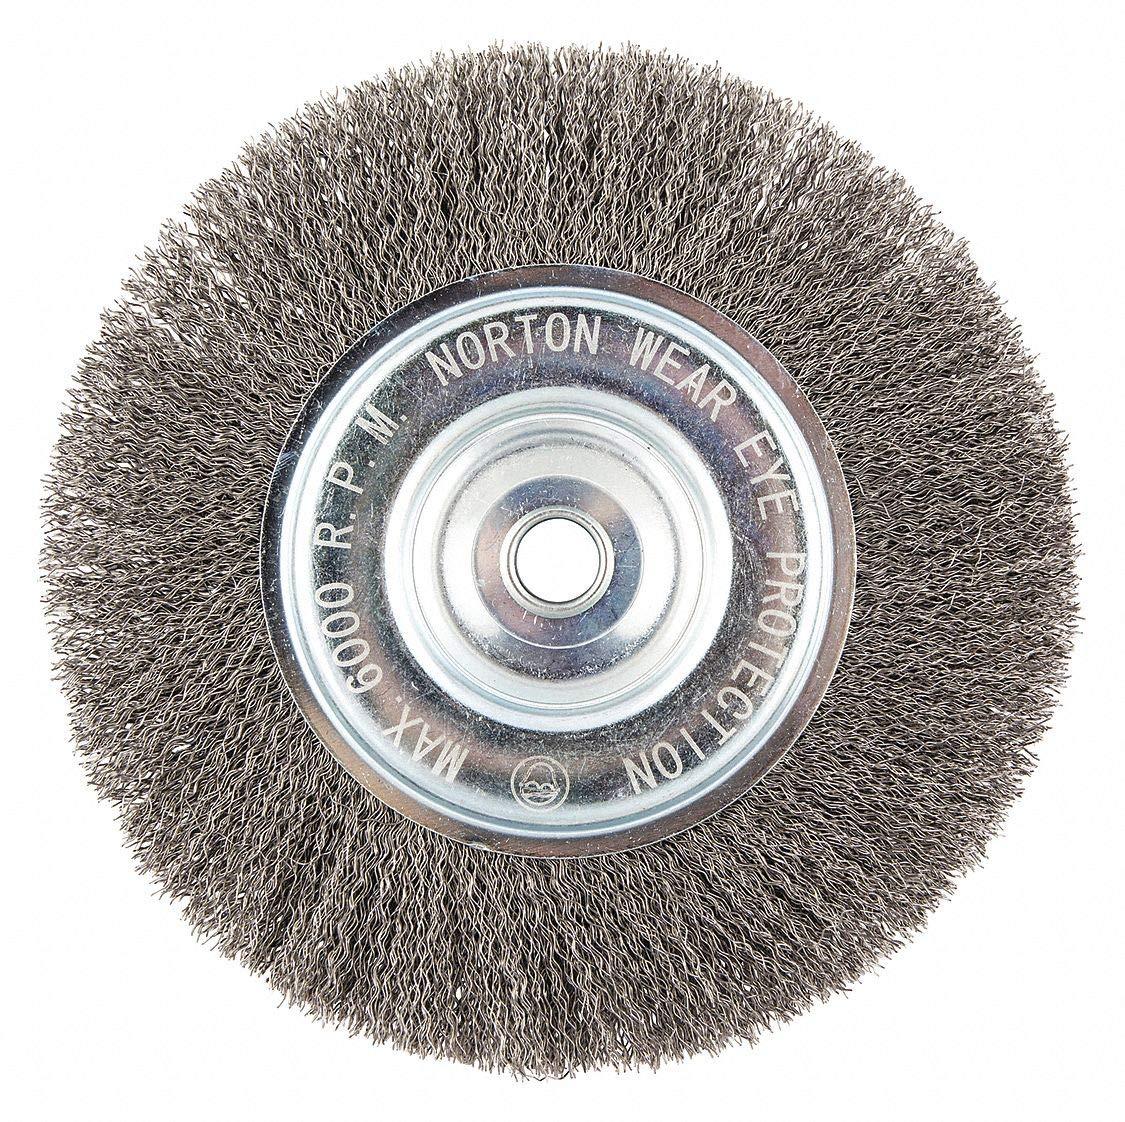 Weiler Trulock Narrow Face Wire Wheel Brush Round Hole Steel Crimped 01178